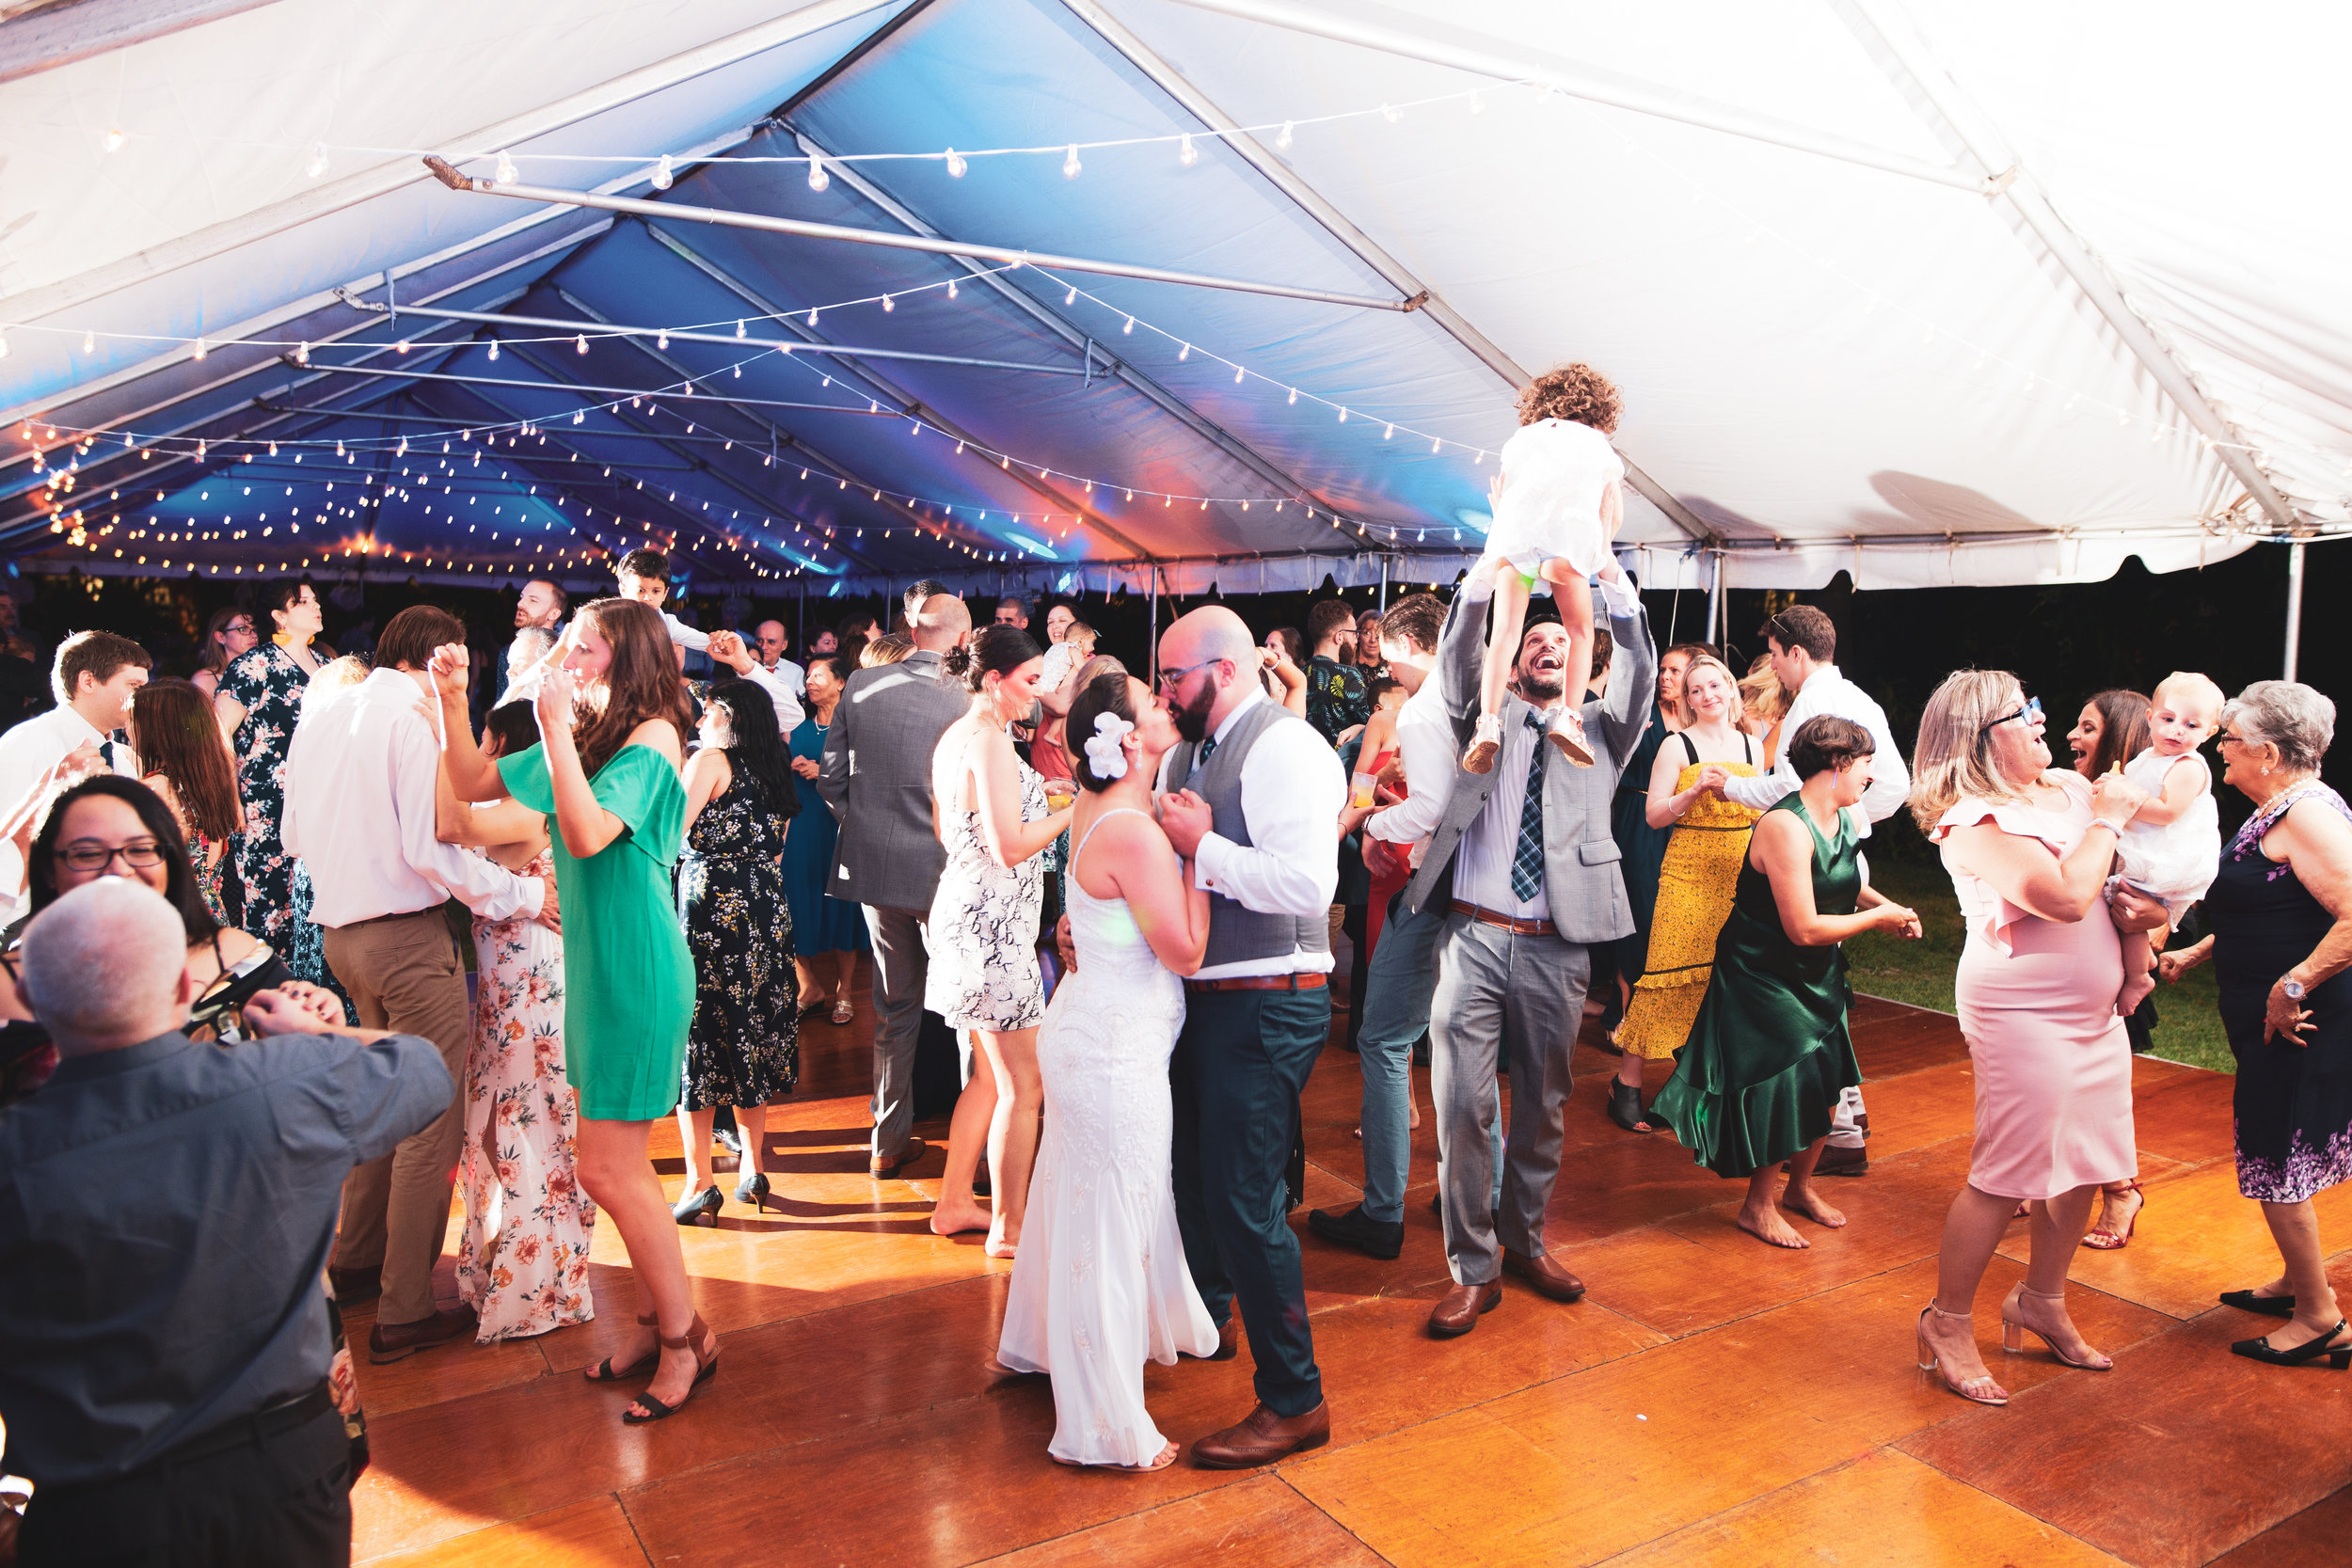 miami beach botanical garden florida wedding © kelilina photography 20190601144748-5.jpg